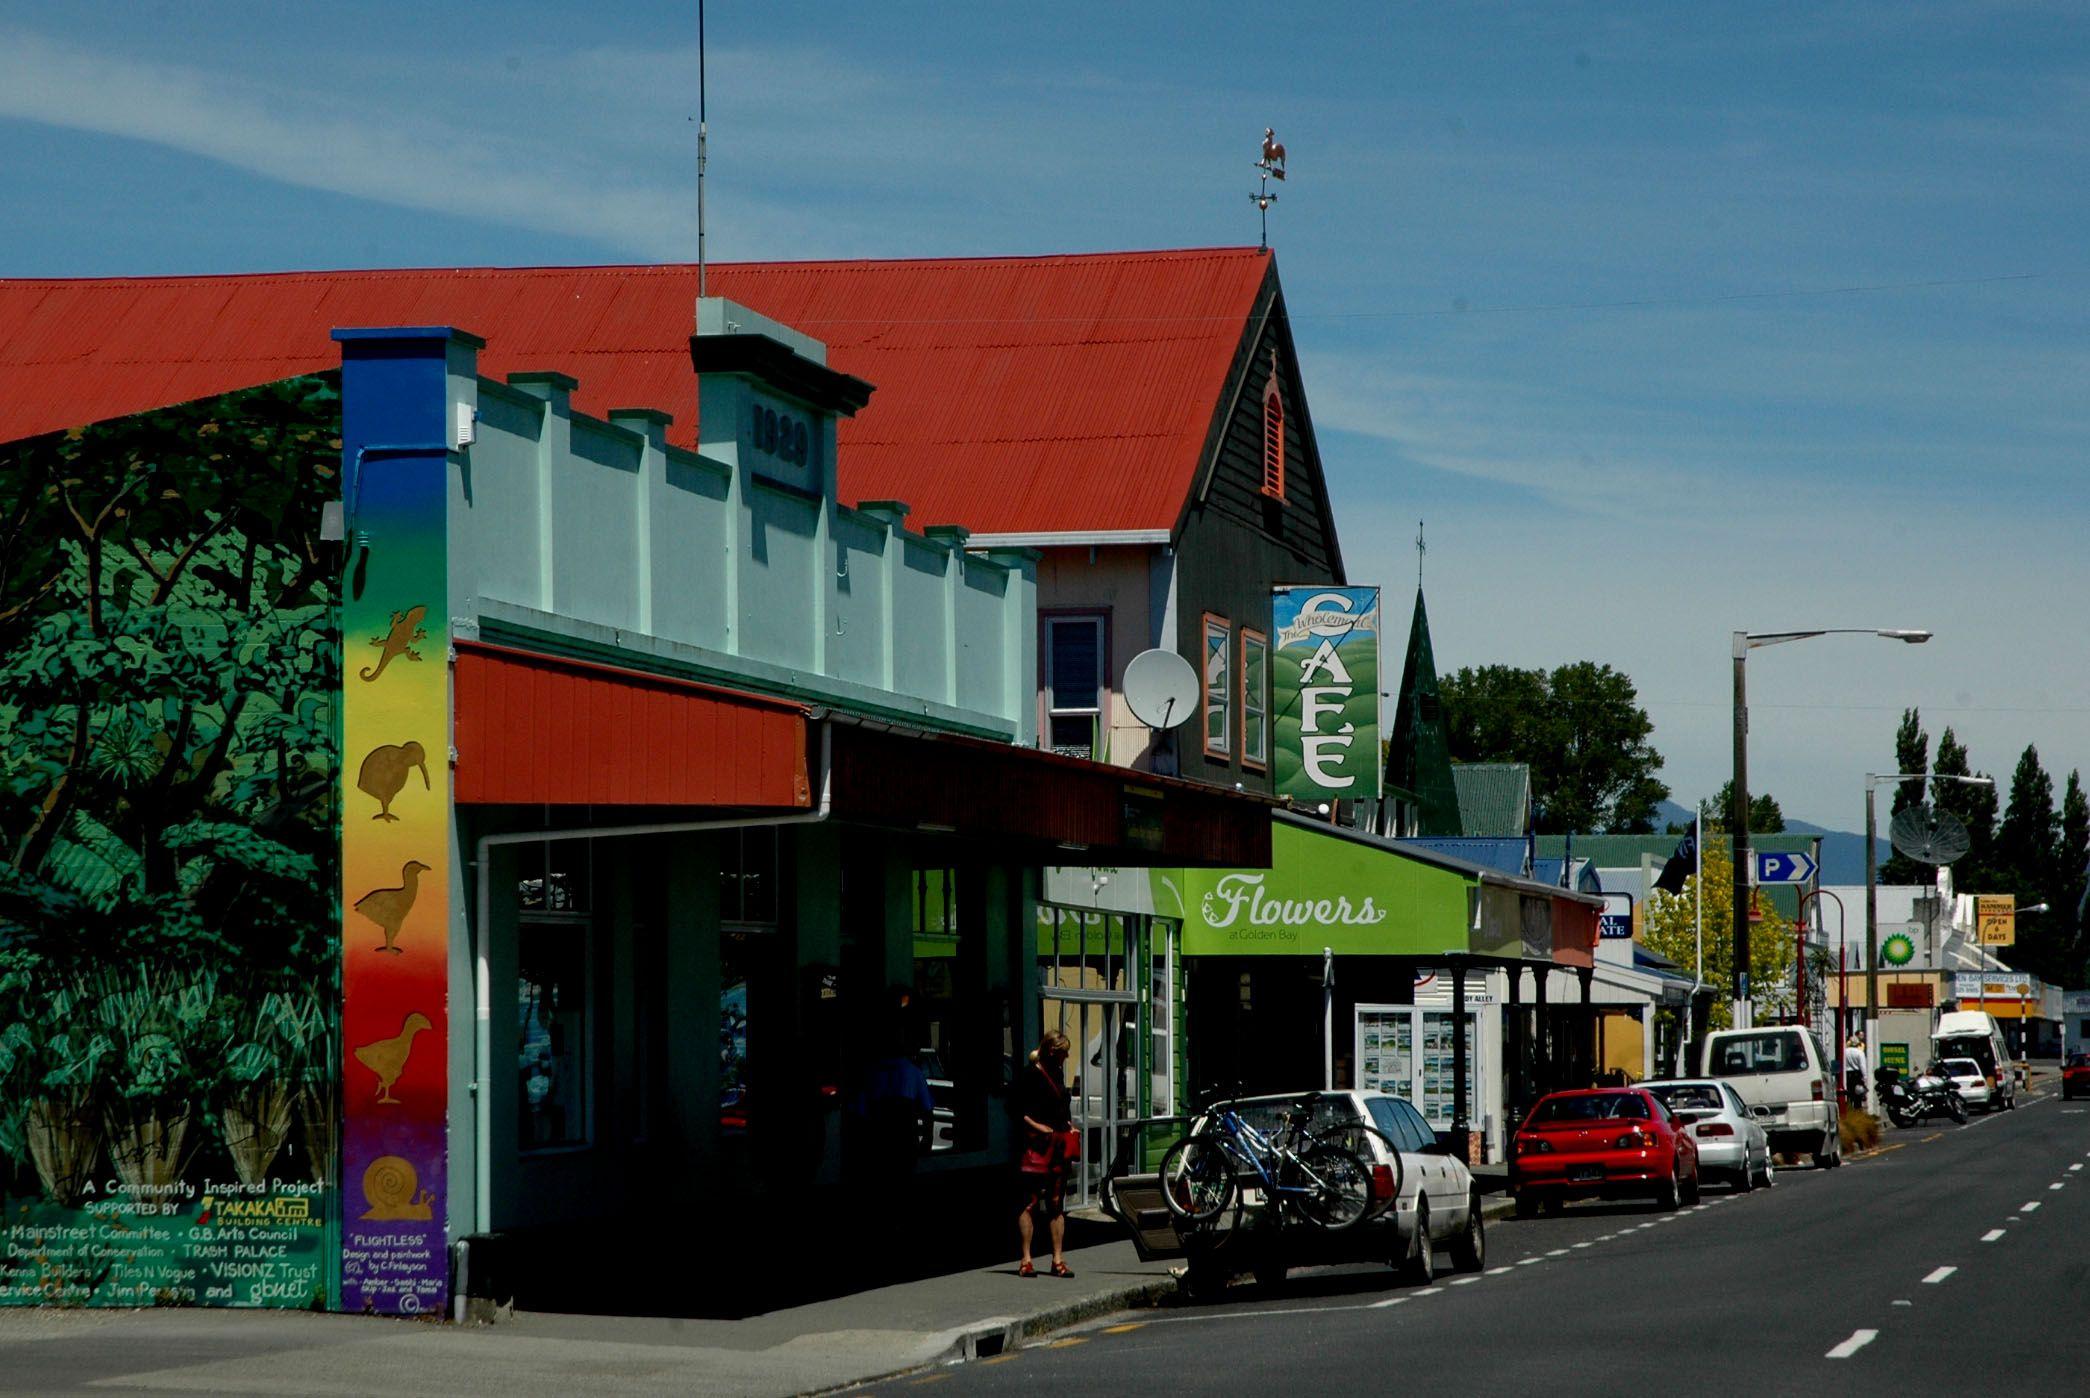 Onekaka New Zealand  City pictures : Takaka   Travel New Zealand   Pinterest